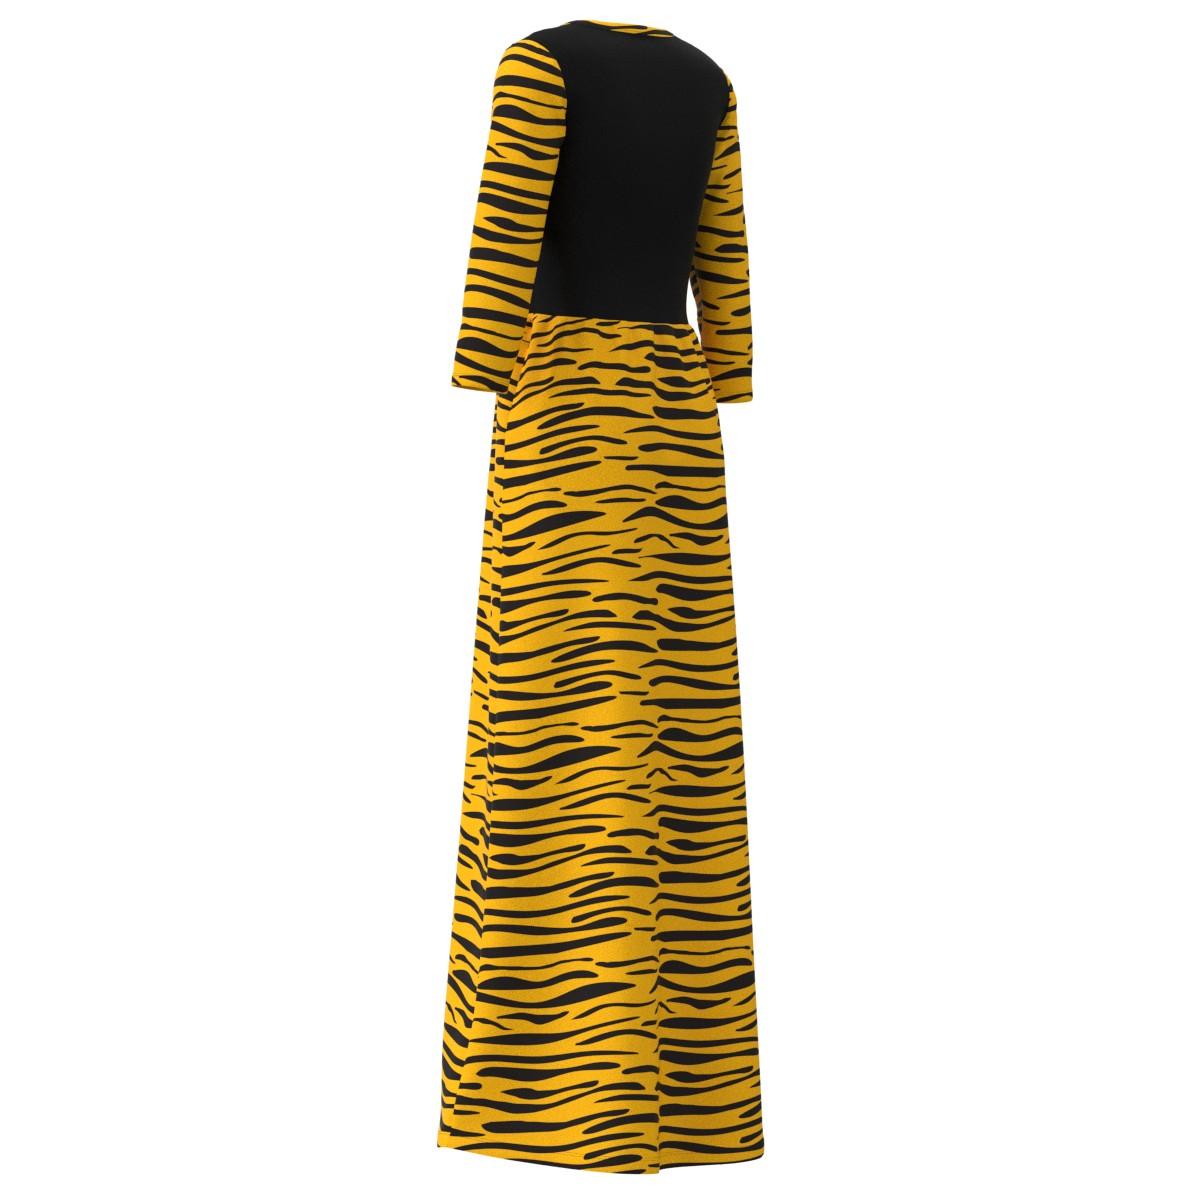 f457d966bfa15 Details about Tiger Stripes Animal Print Quarter Sleeve Long Maxi Dress  Size XS-3XL Plus